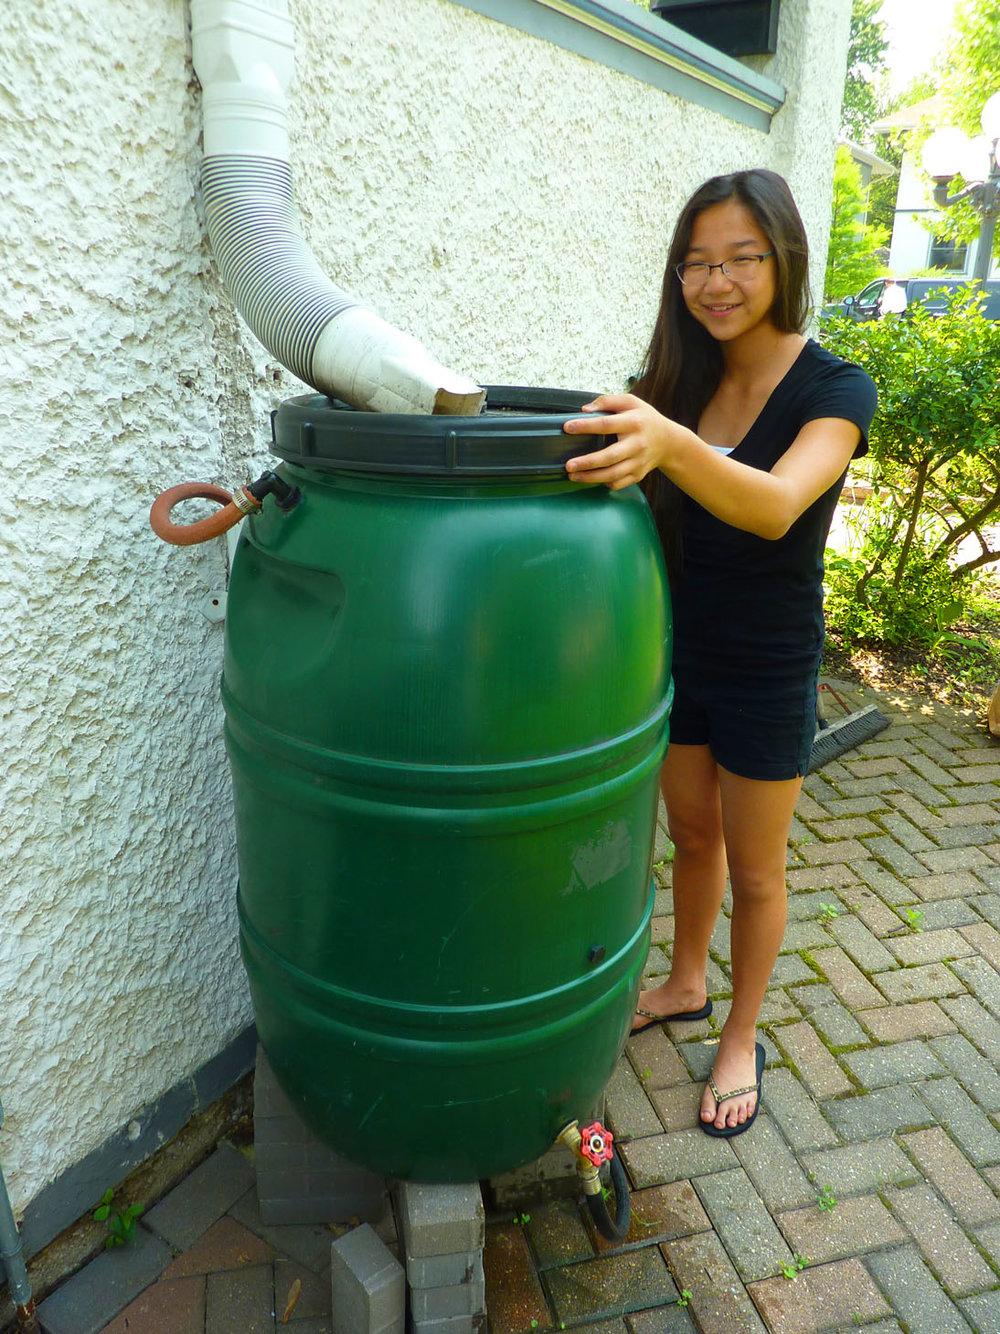 Oak Parker Kiana Gill checks one of her family rain barrels.